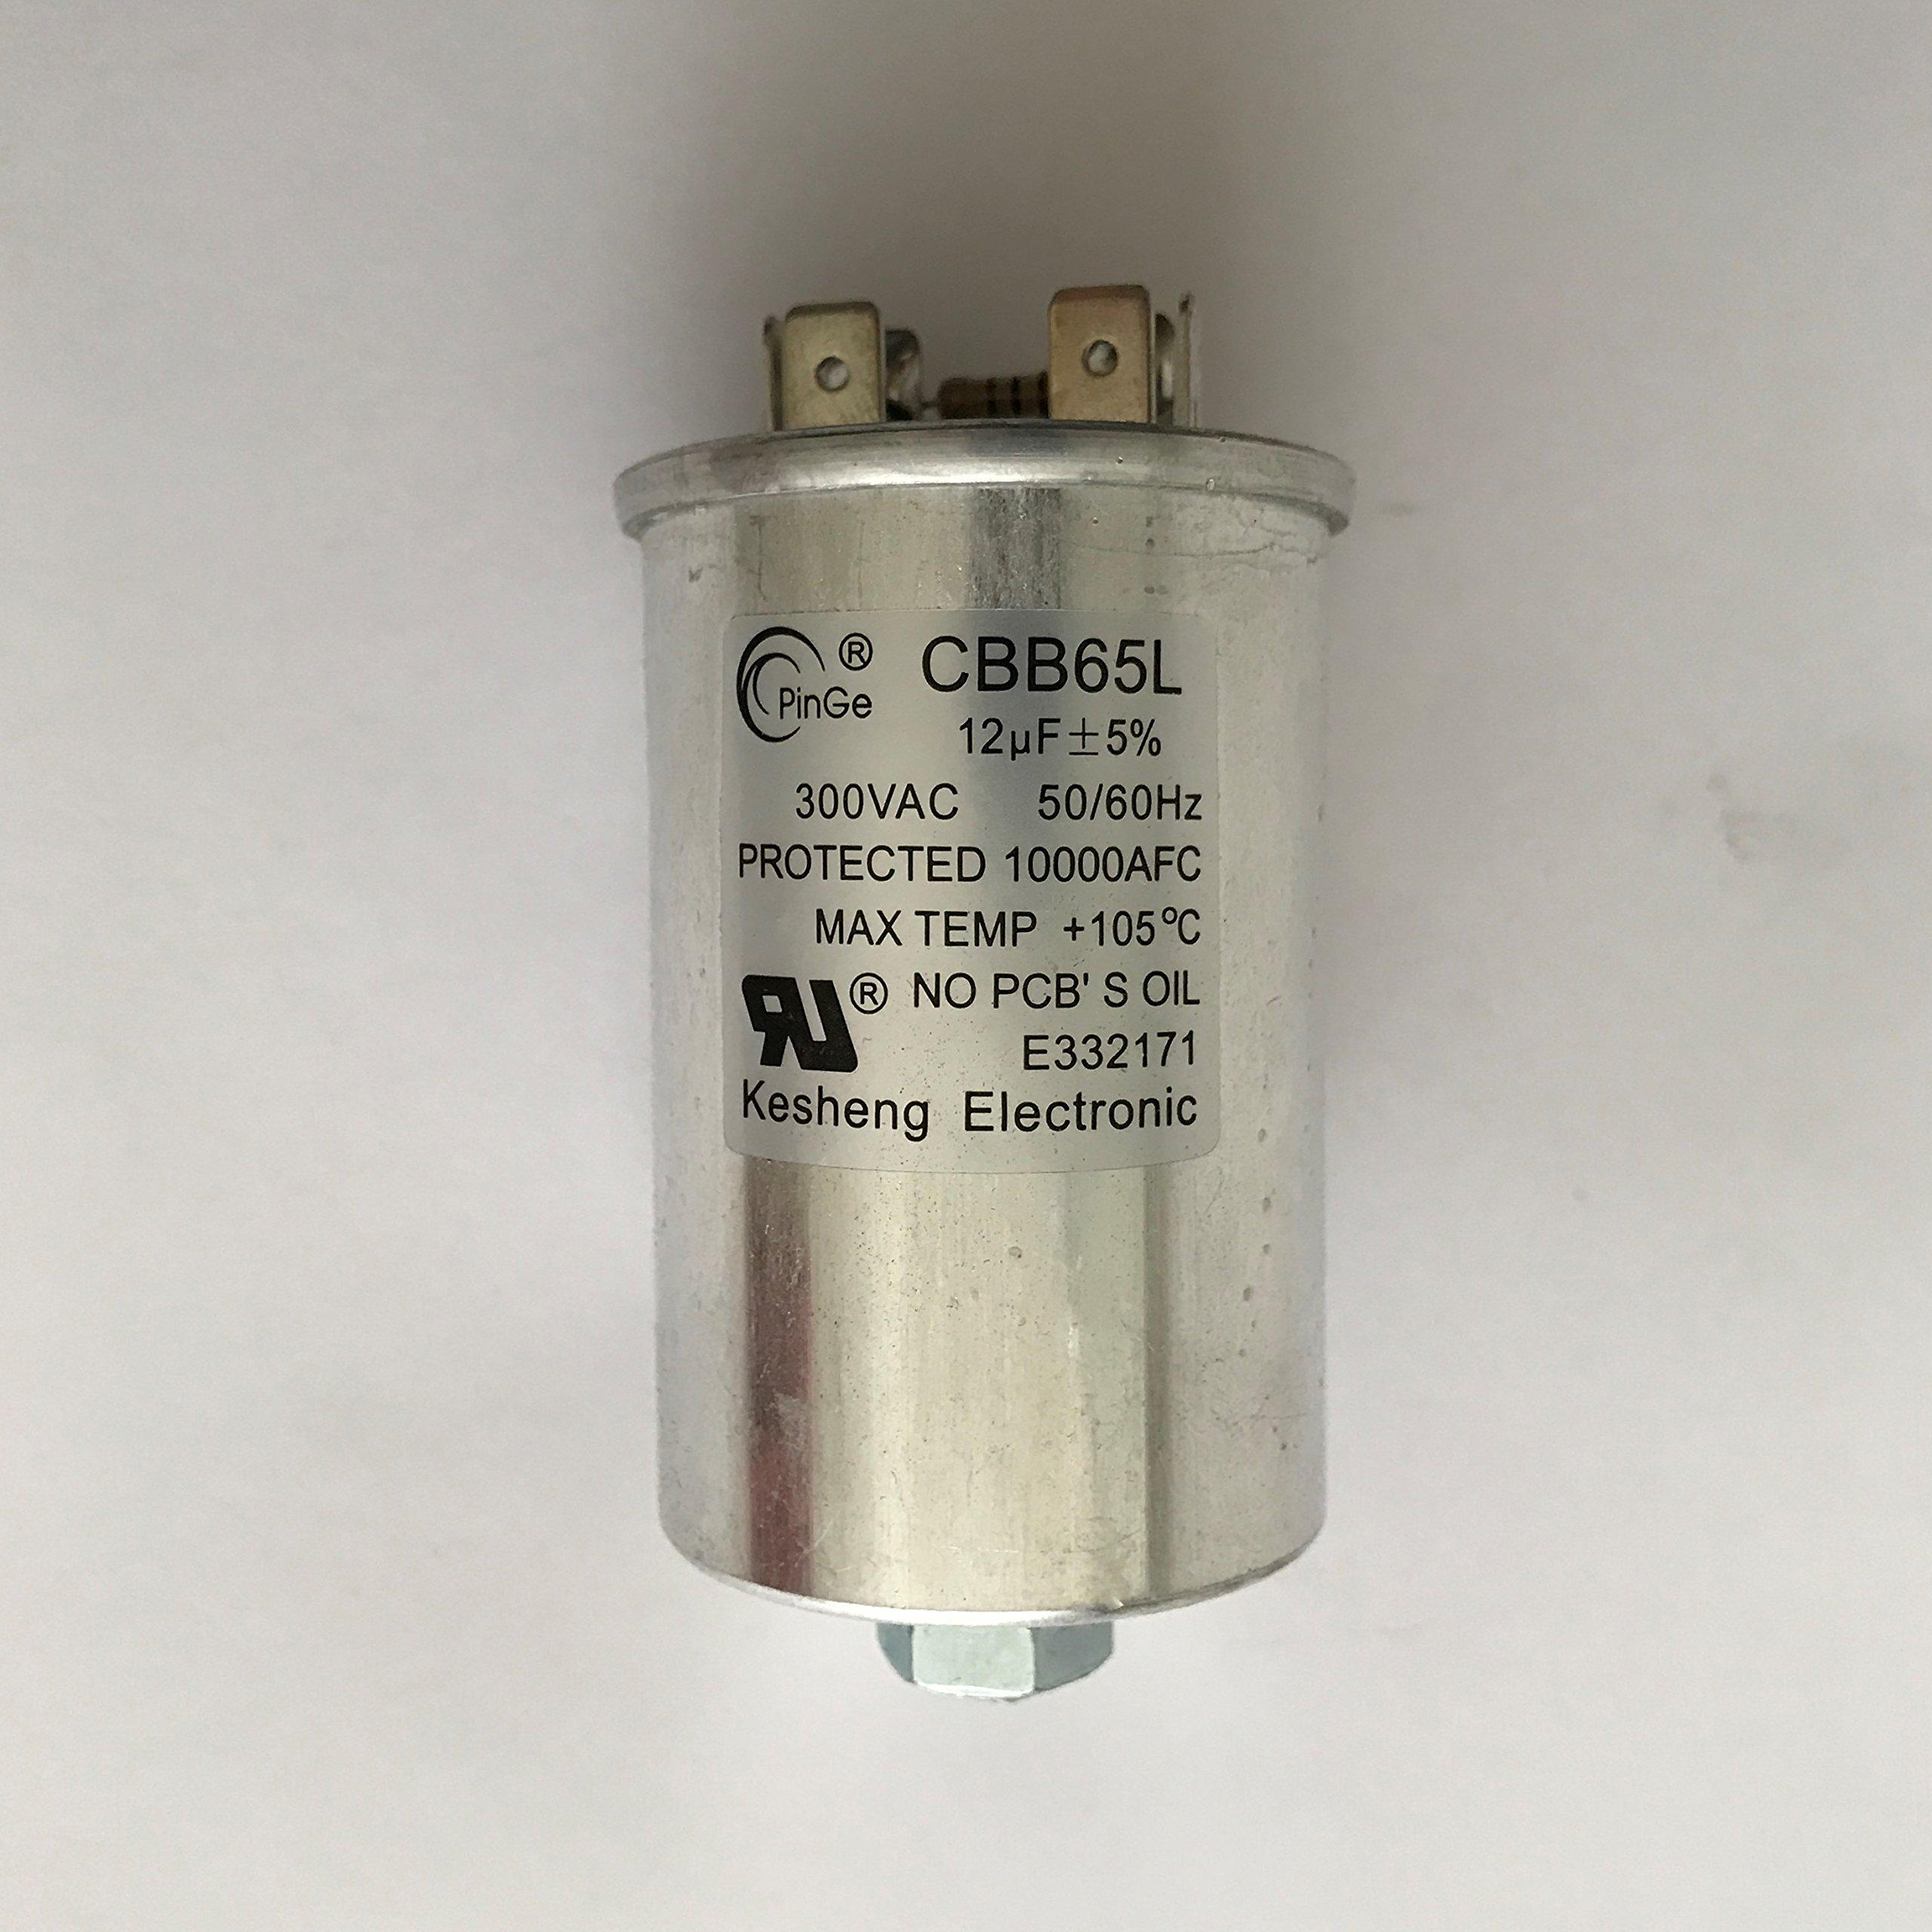 Capacitor 12uF/300VAC 120-480 Volt for Metal Halide 100 Watt-HX (1 Piece)